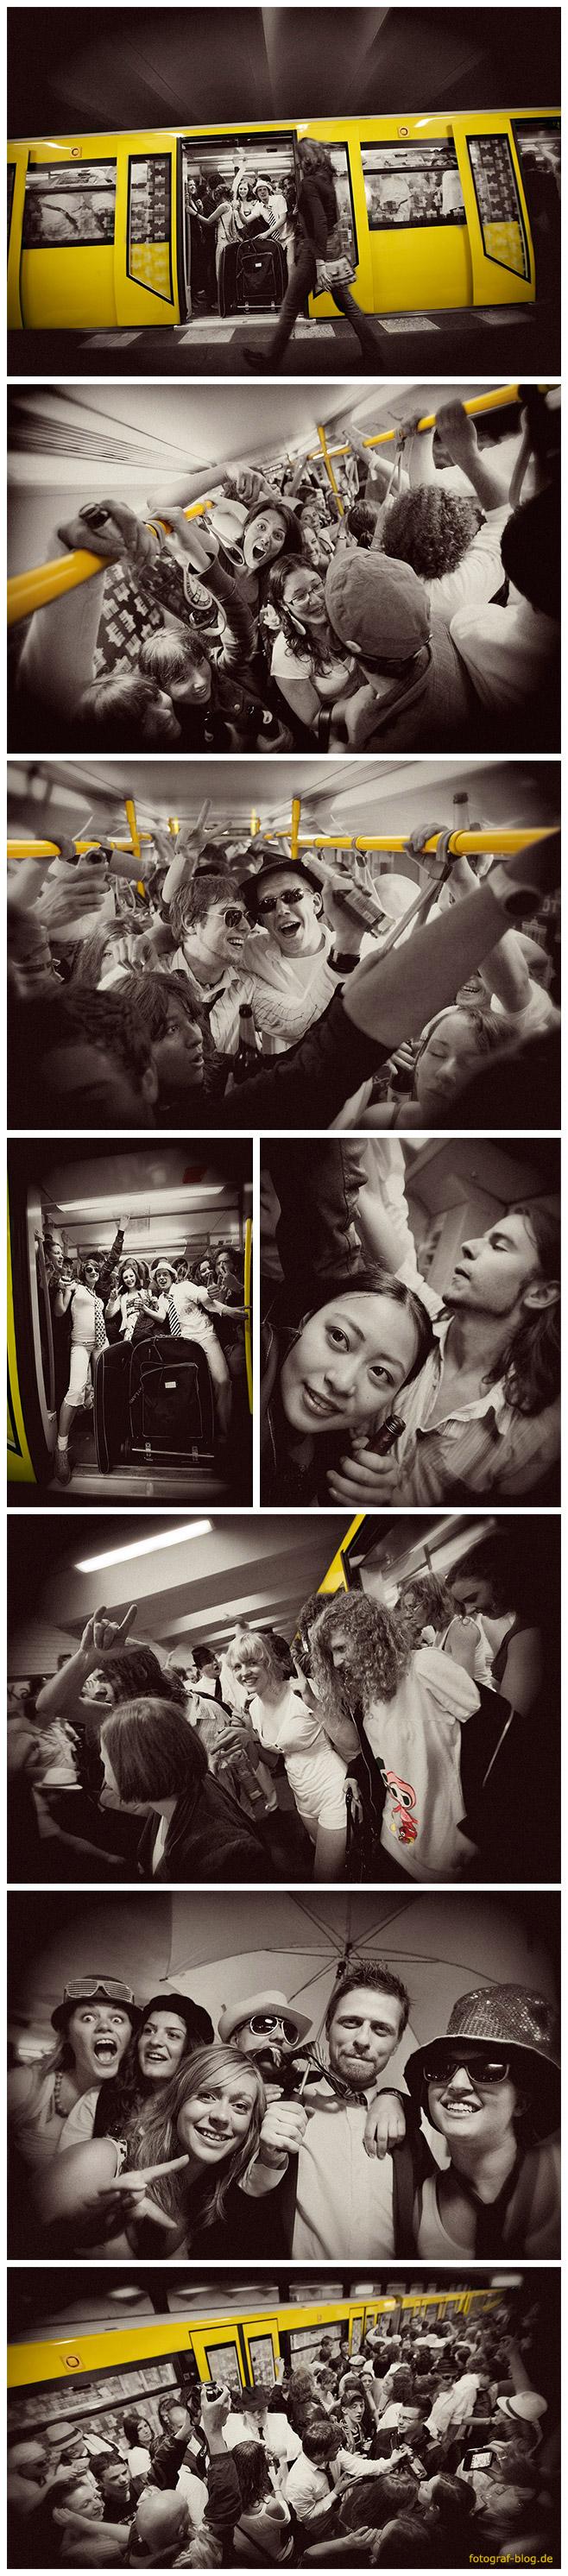 U-Bahn-Party